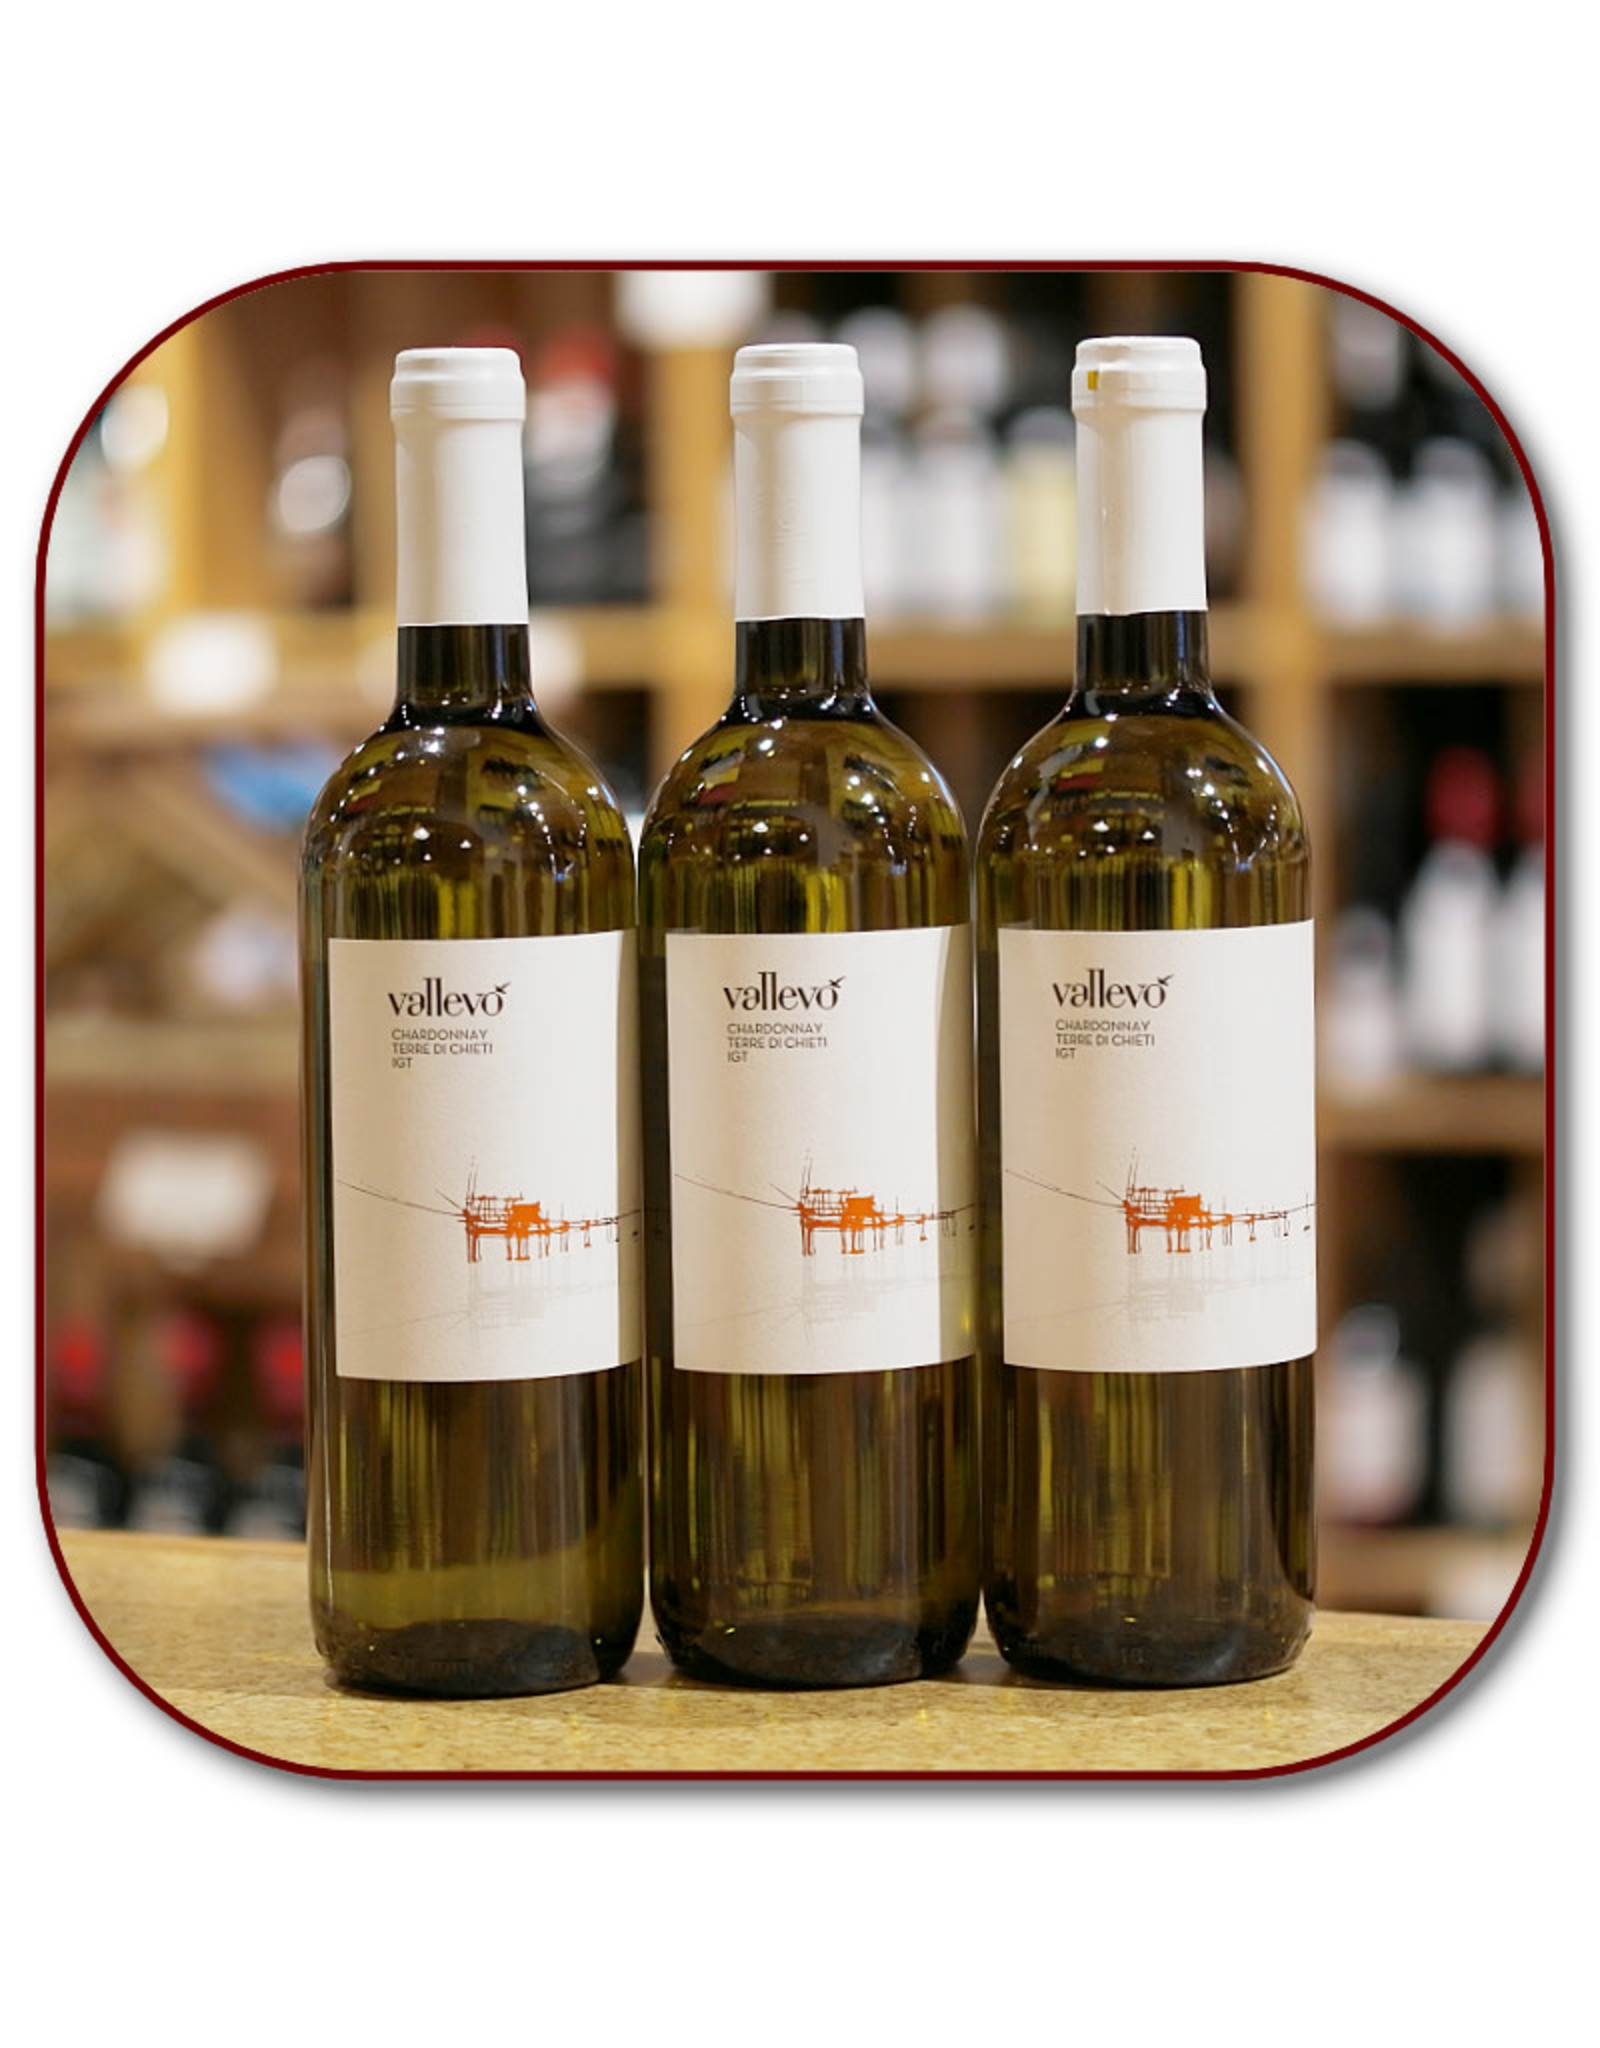 Chardonnay Vallevo Chardonnay Unoaked IGT 20